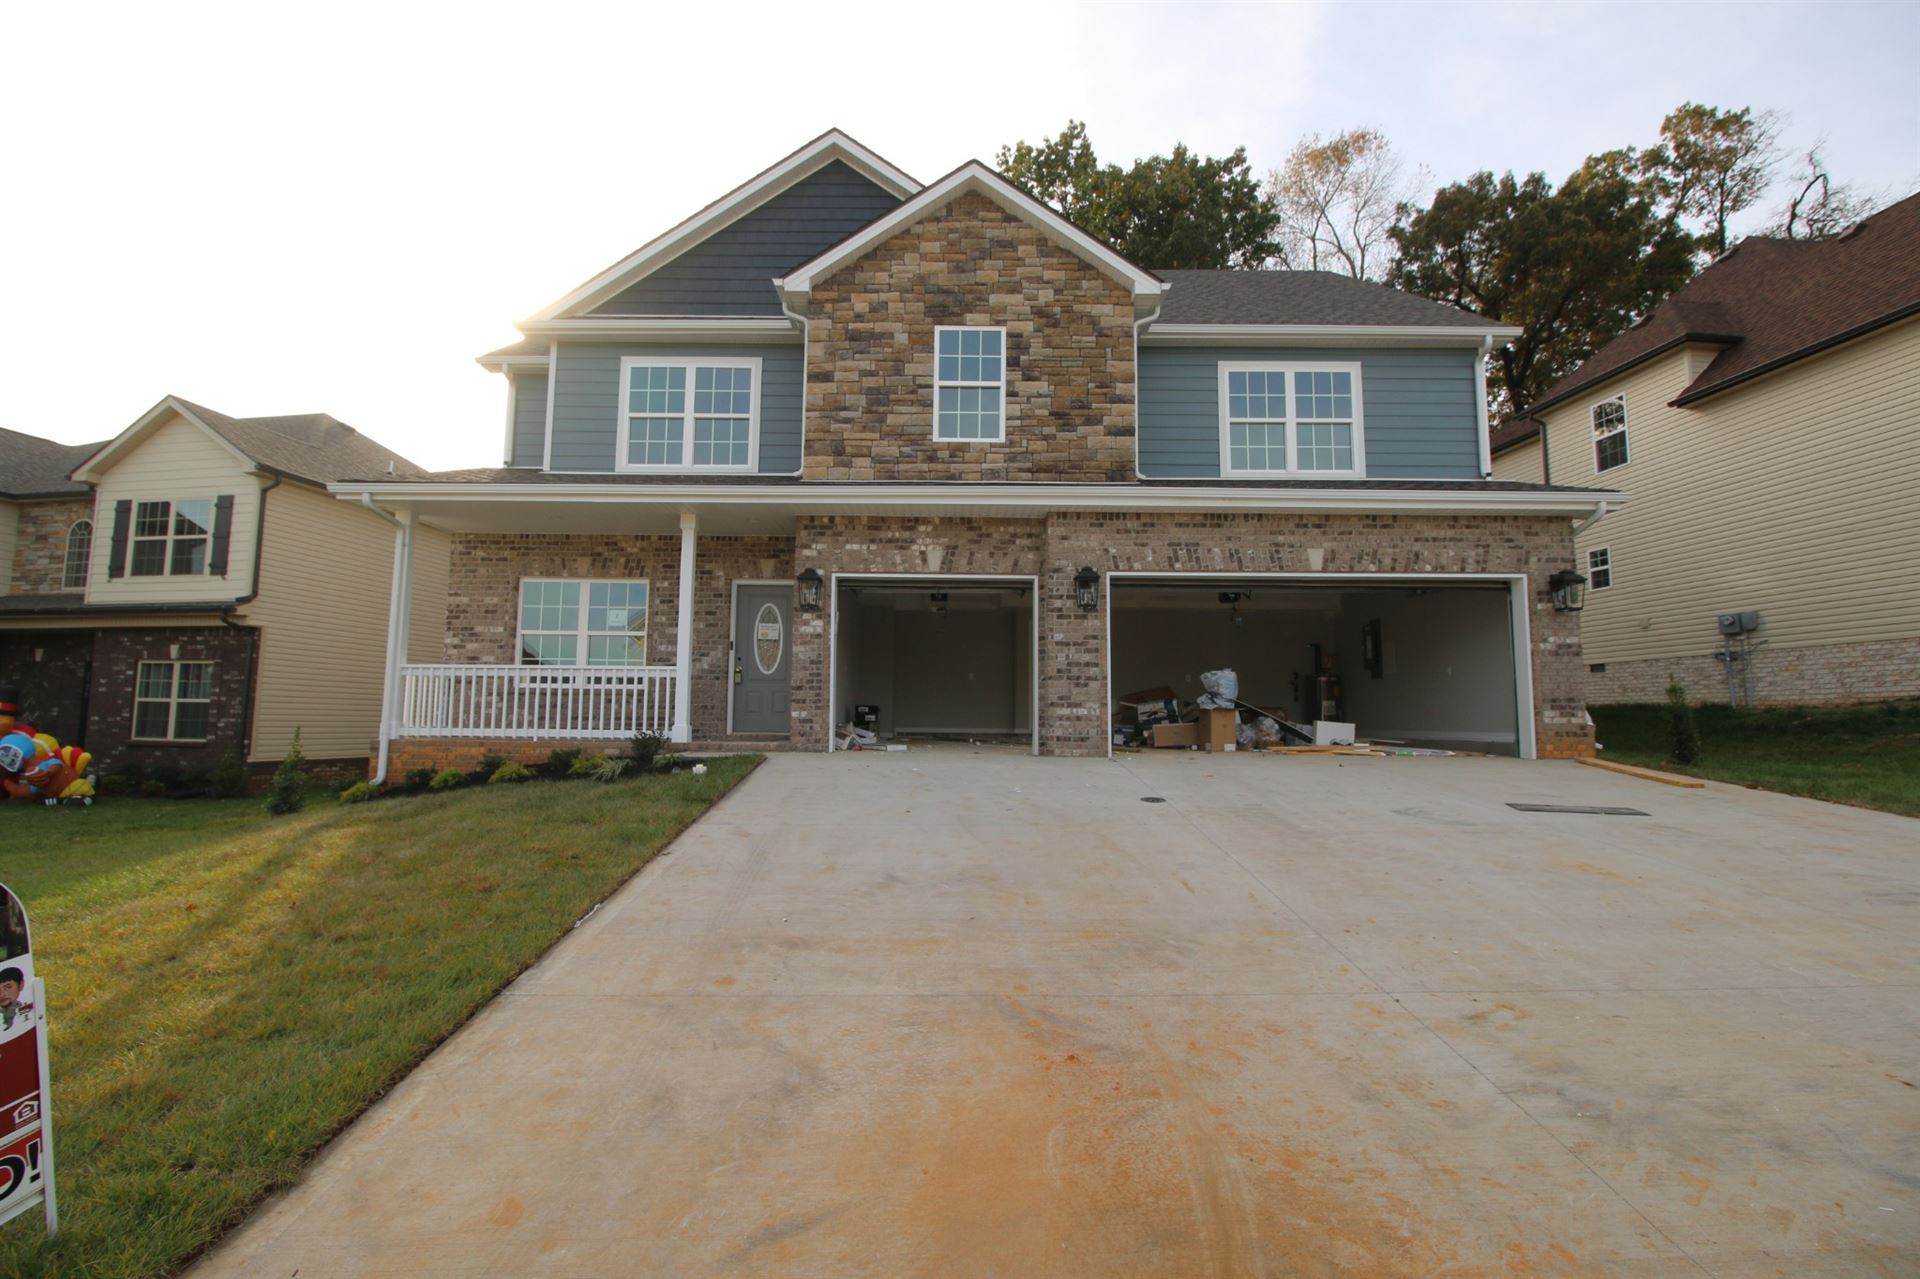 2 Charleston Oaks Reserves, Clarksville, TN 37042 - MLS#: 2280718